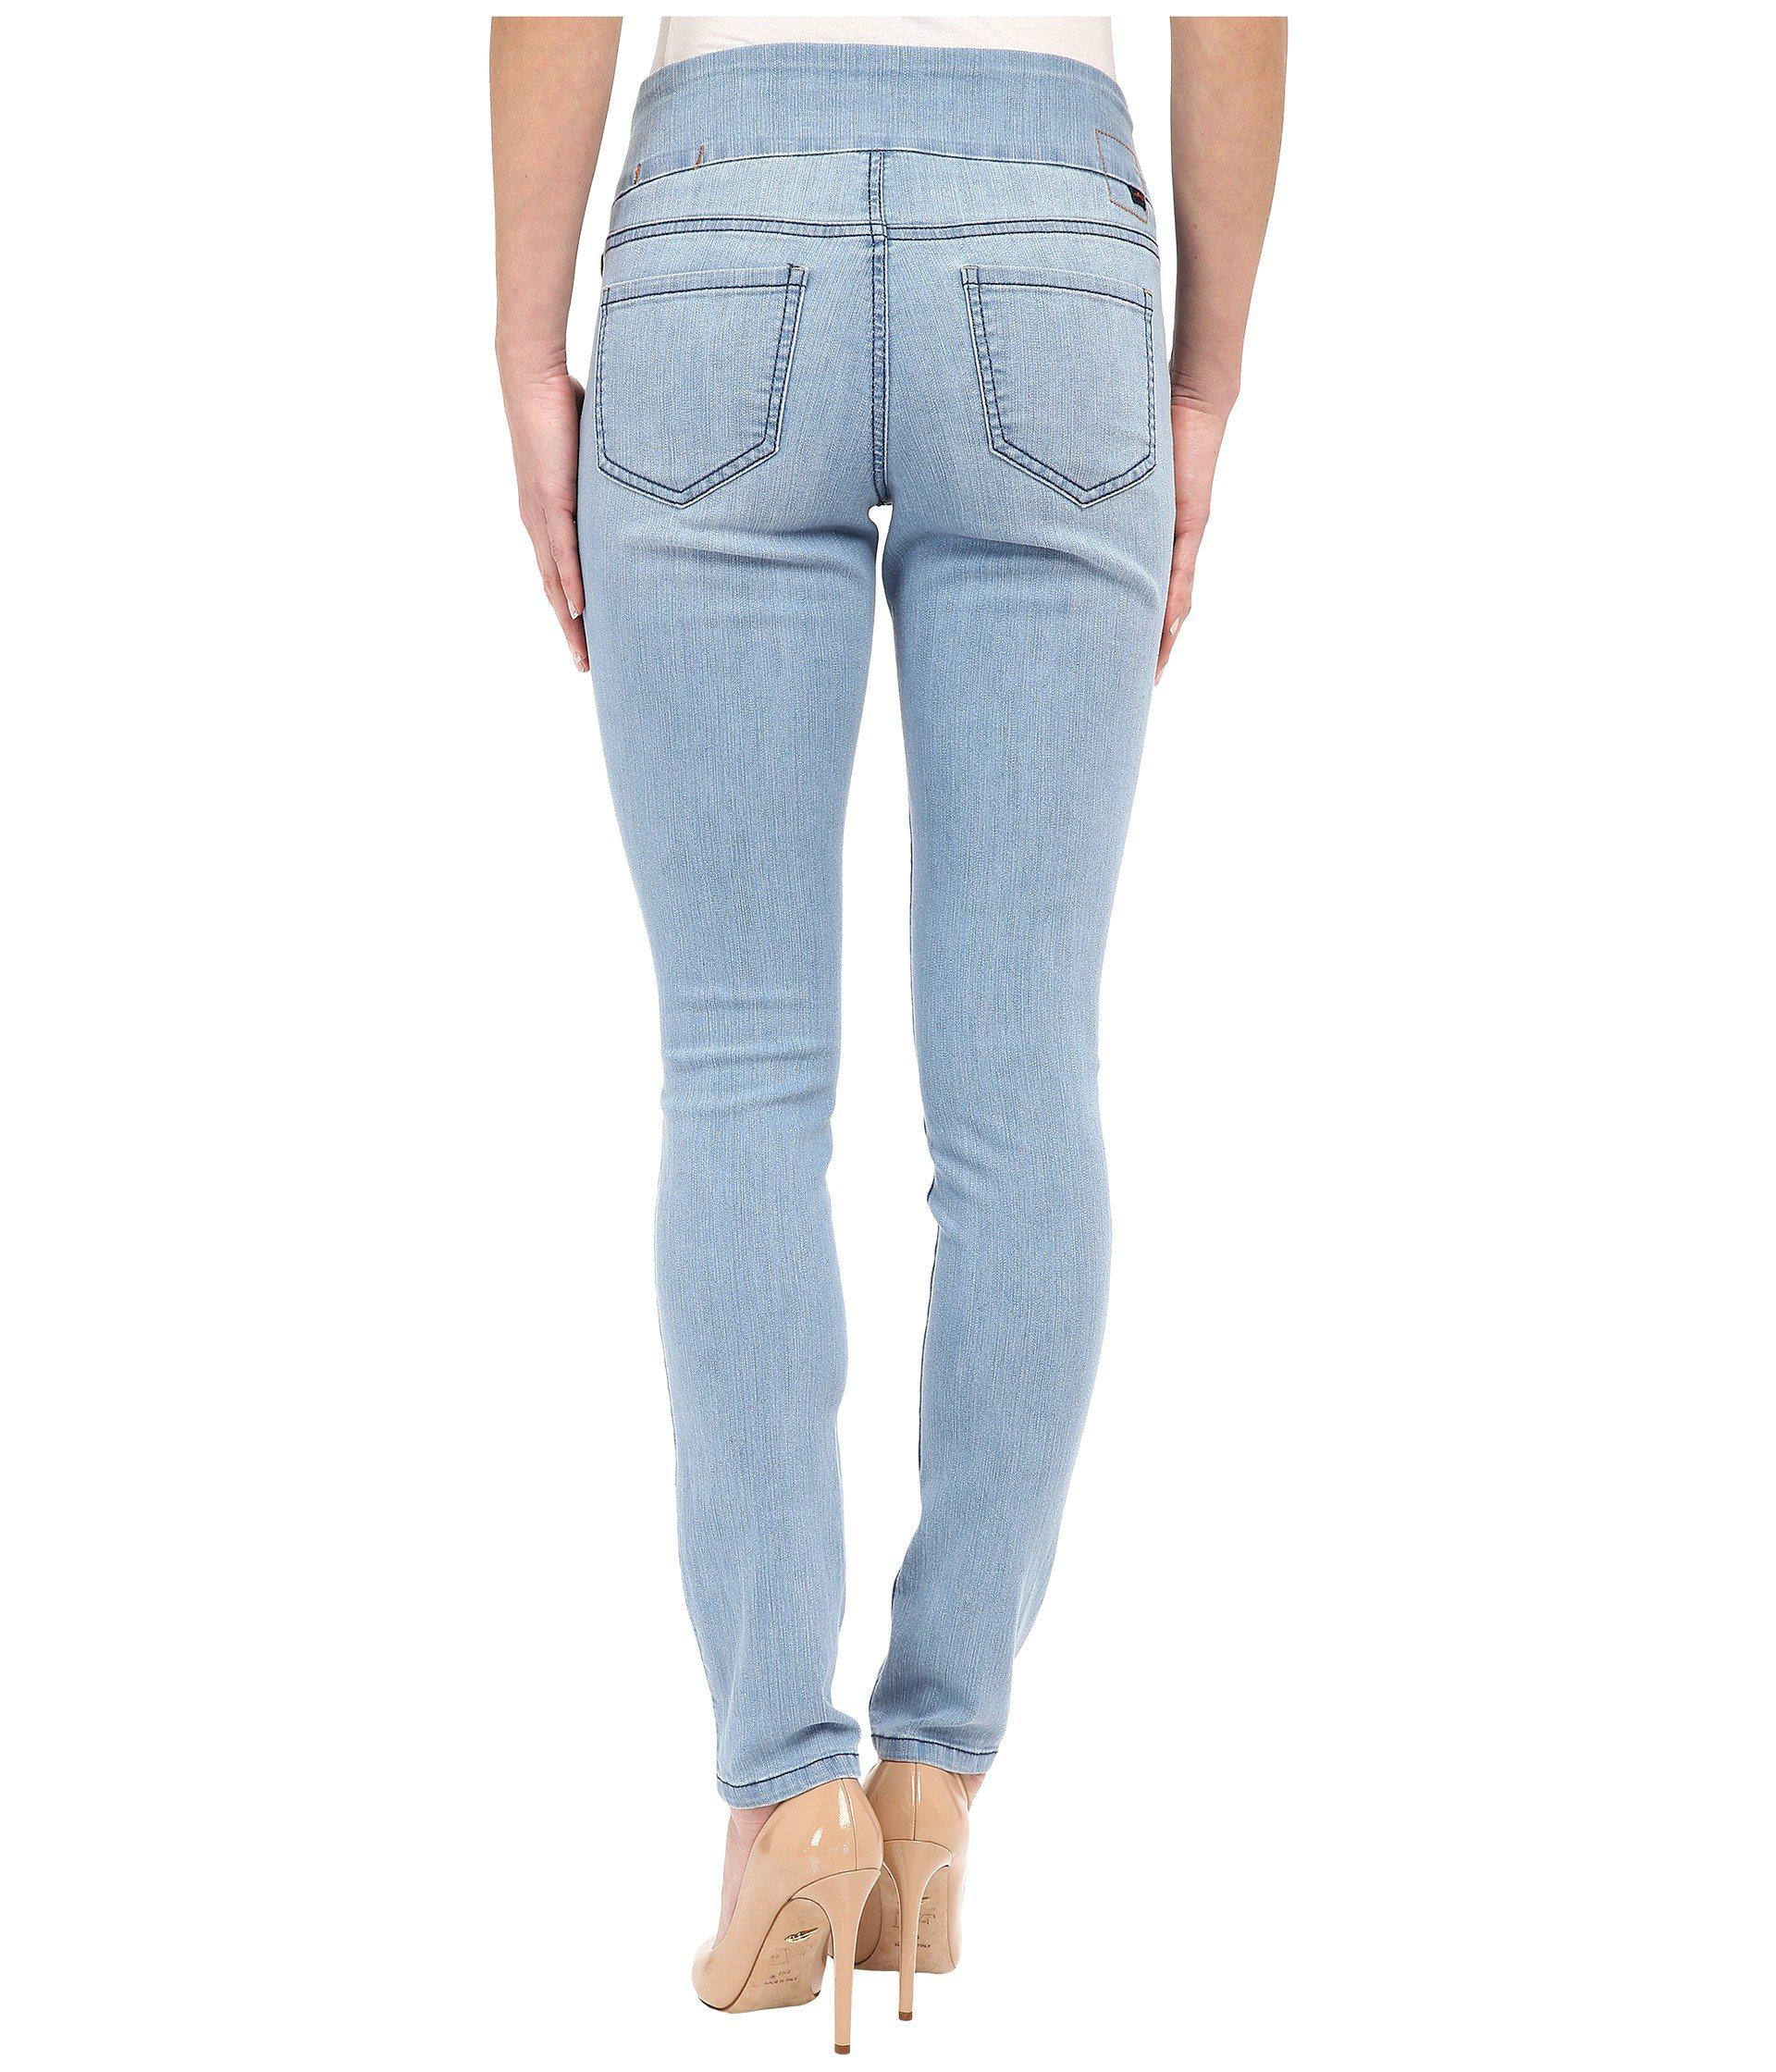 men fit pants s classic waist tall elastic croft comfort pin jeans size comforter full blue barrow big